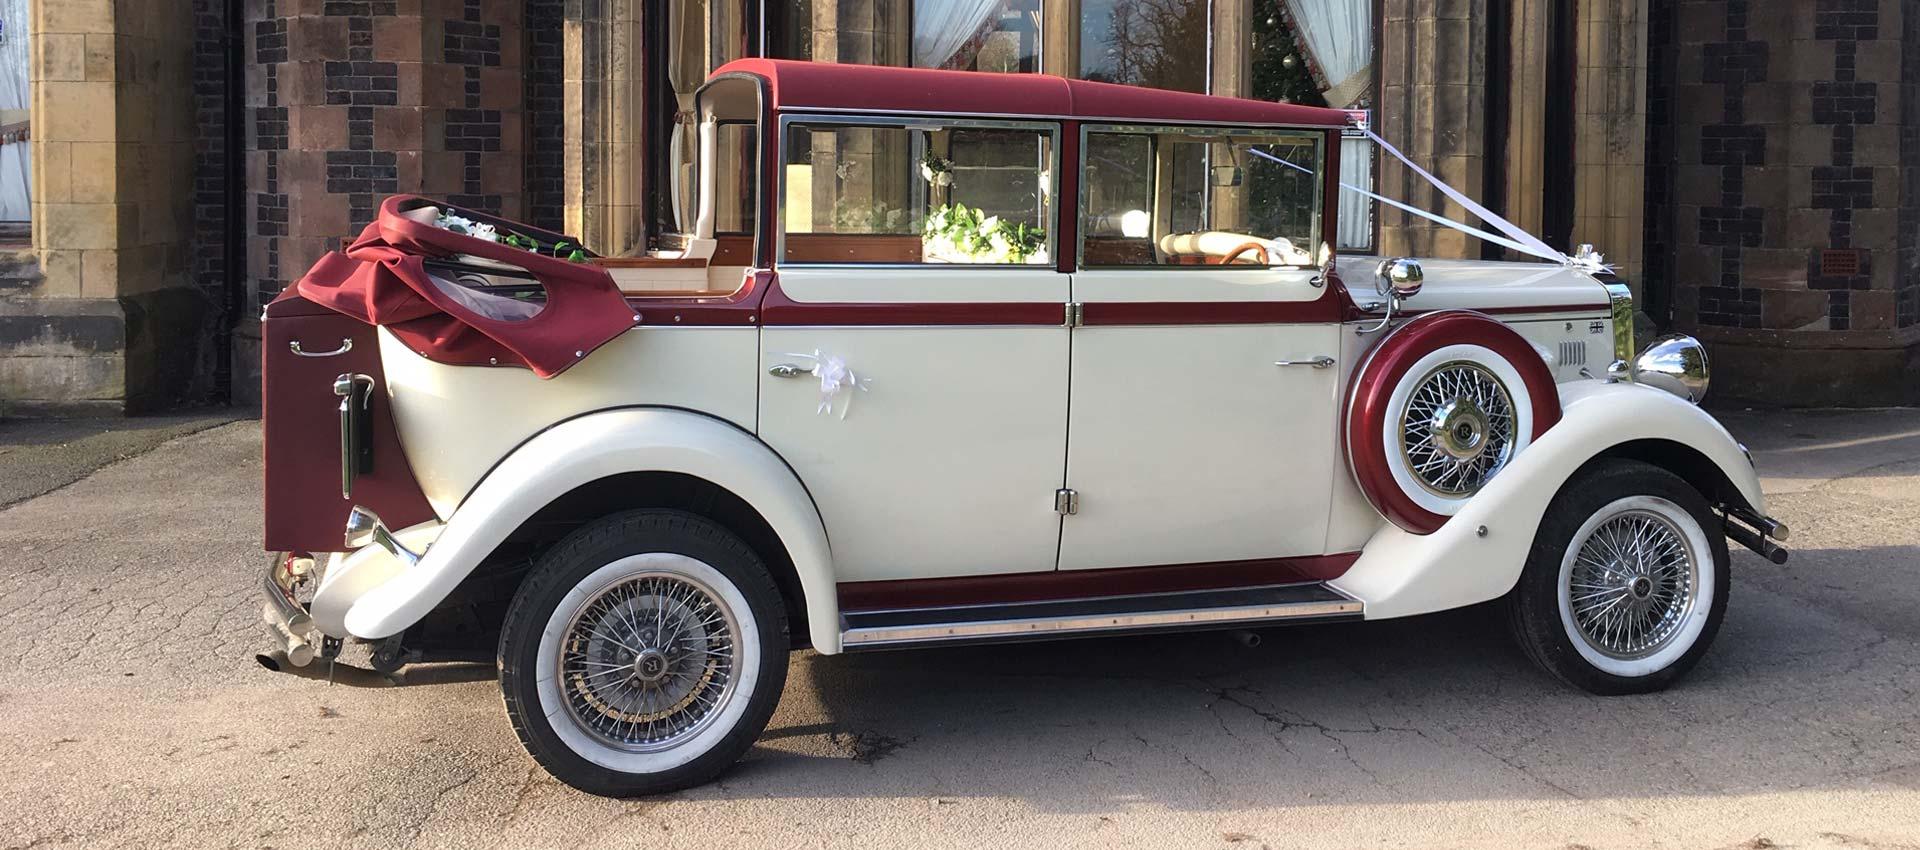 Vintage Car Wedding Hire Chauffeur Manchester Cheshire